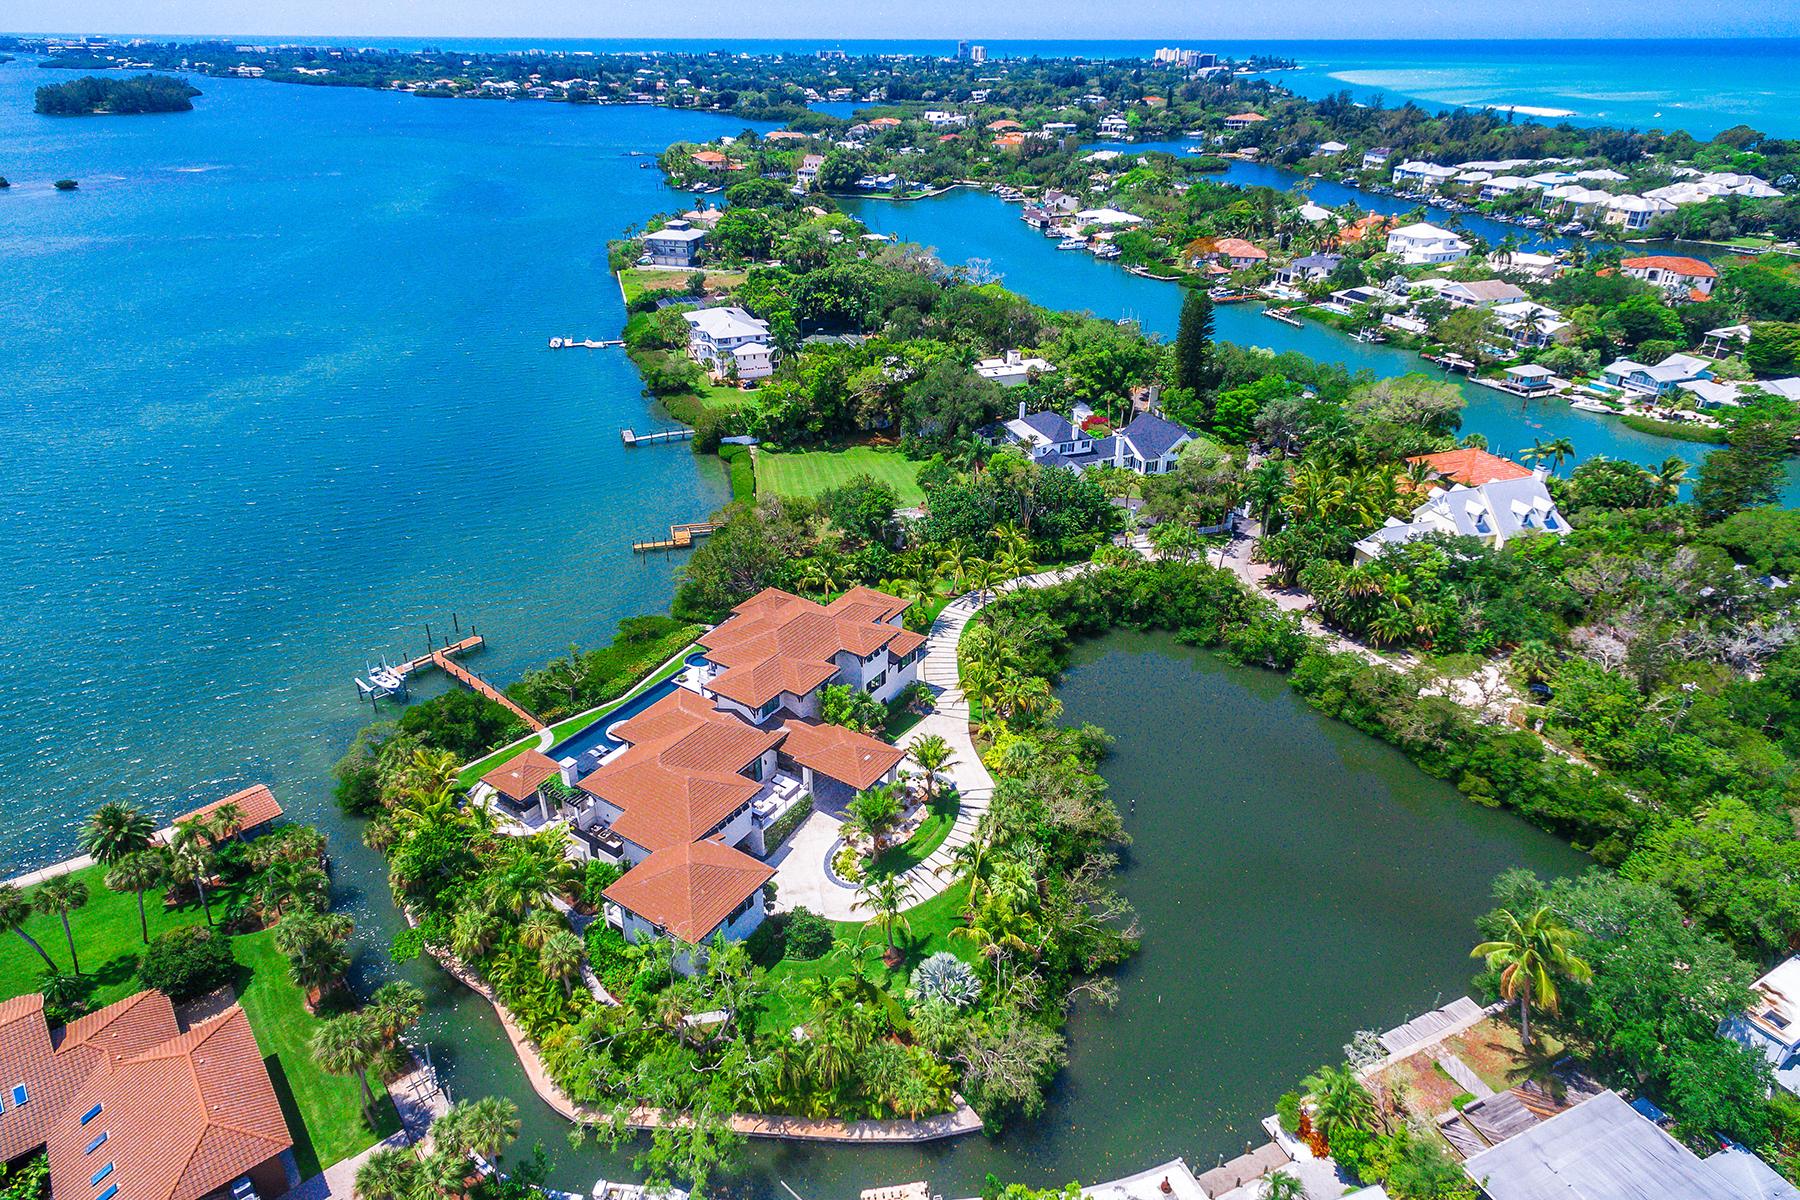 Single Family Homes for Active at BAY ISLAND 3799 Flamingo Ave Sarasota, Florida 34242 United States